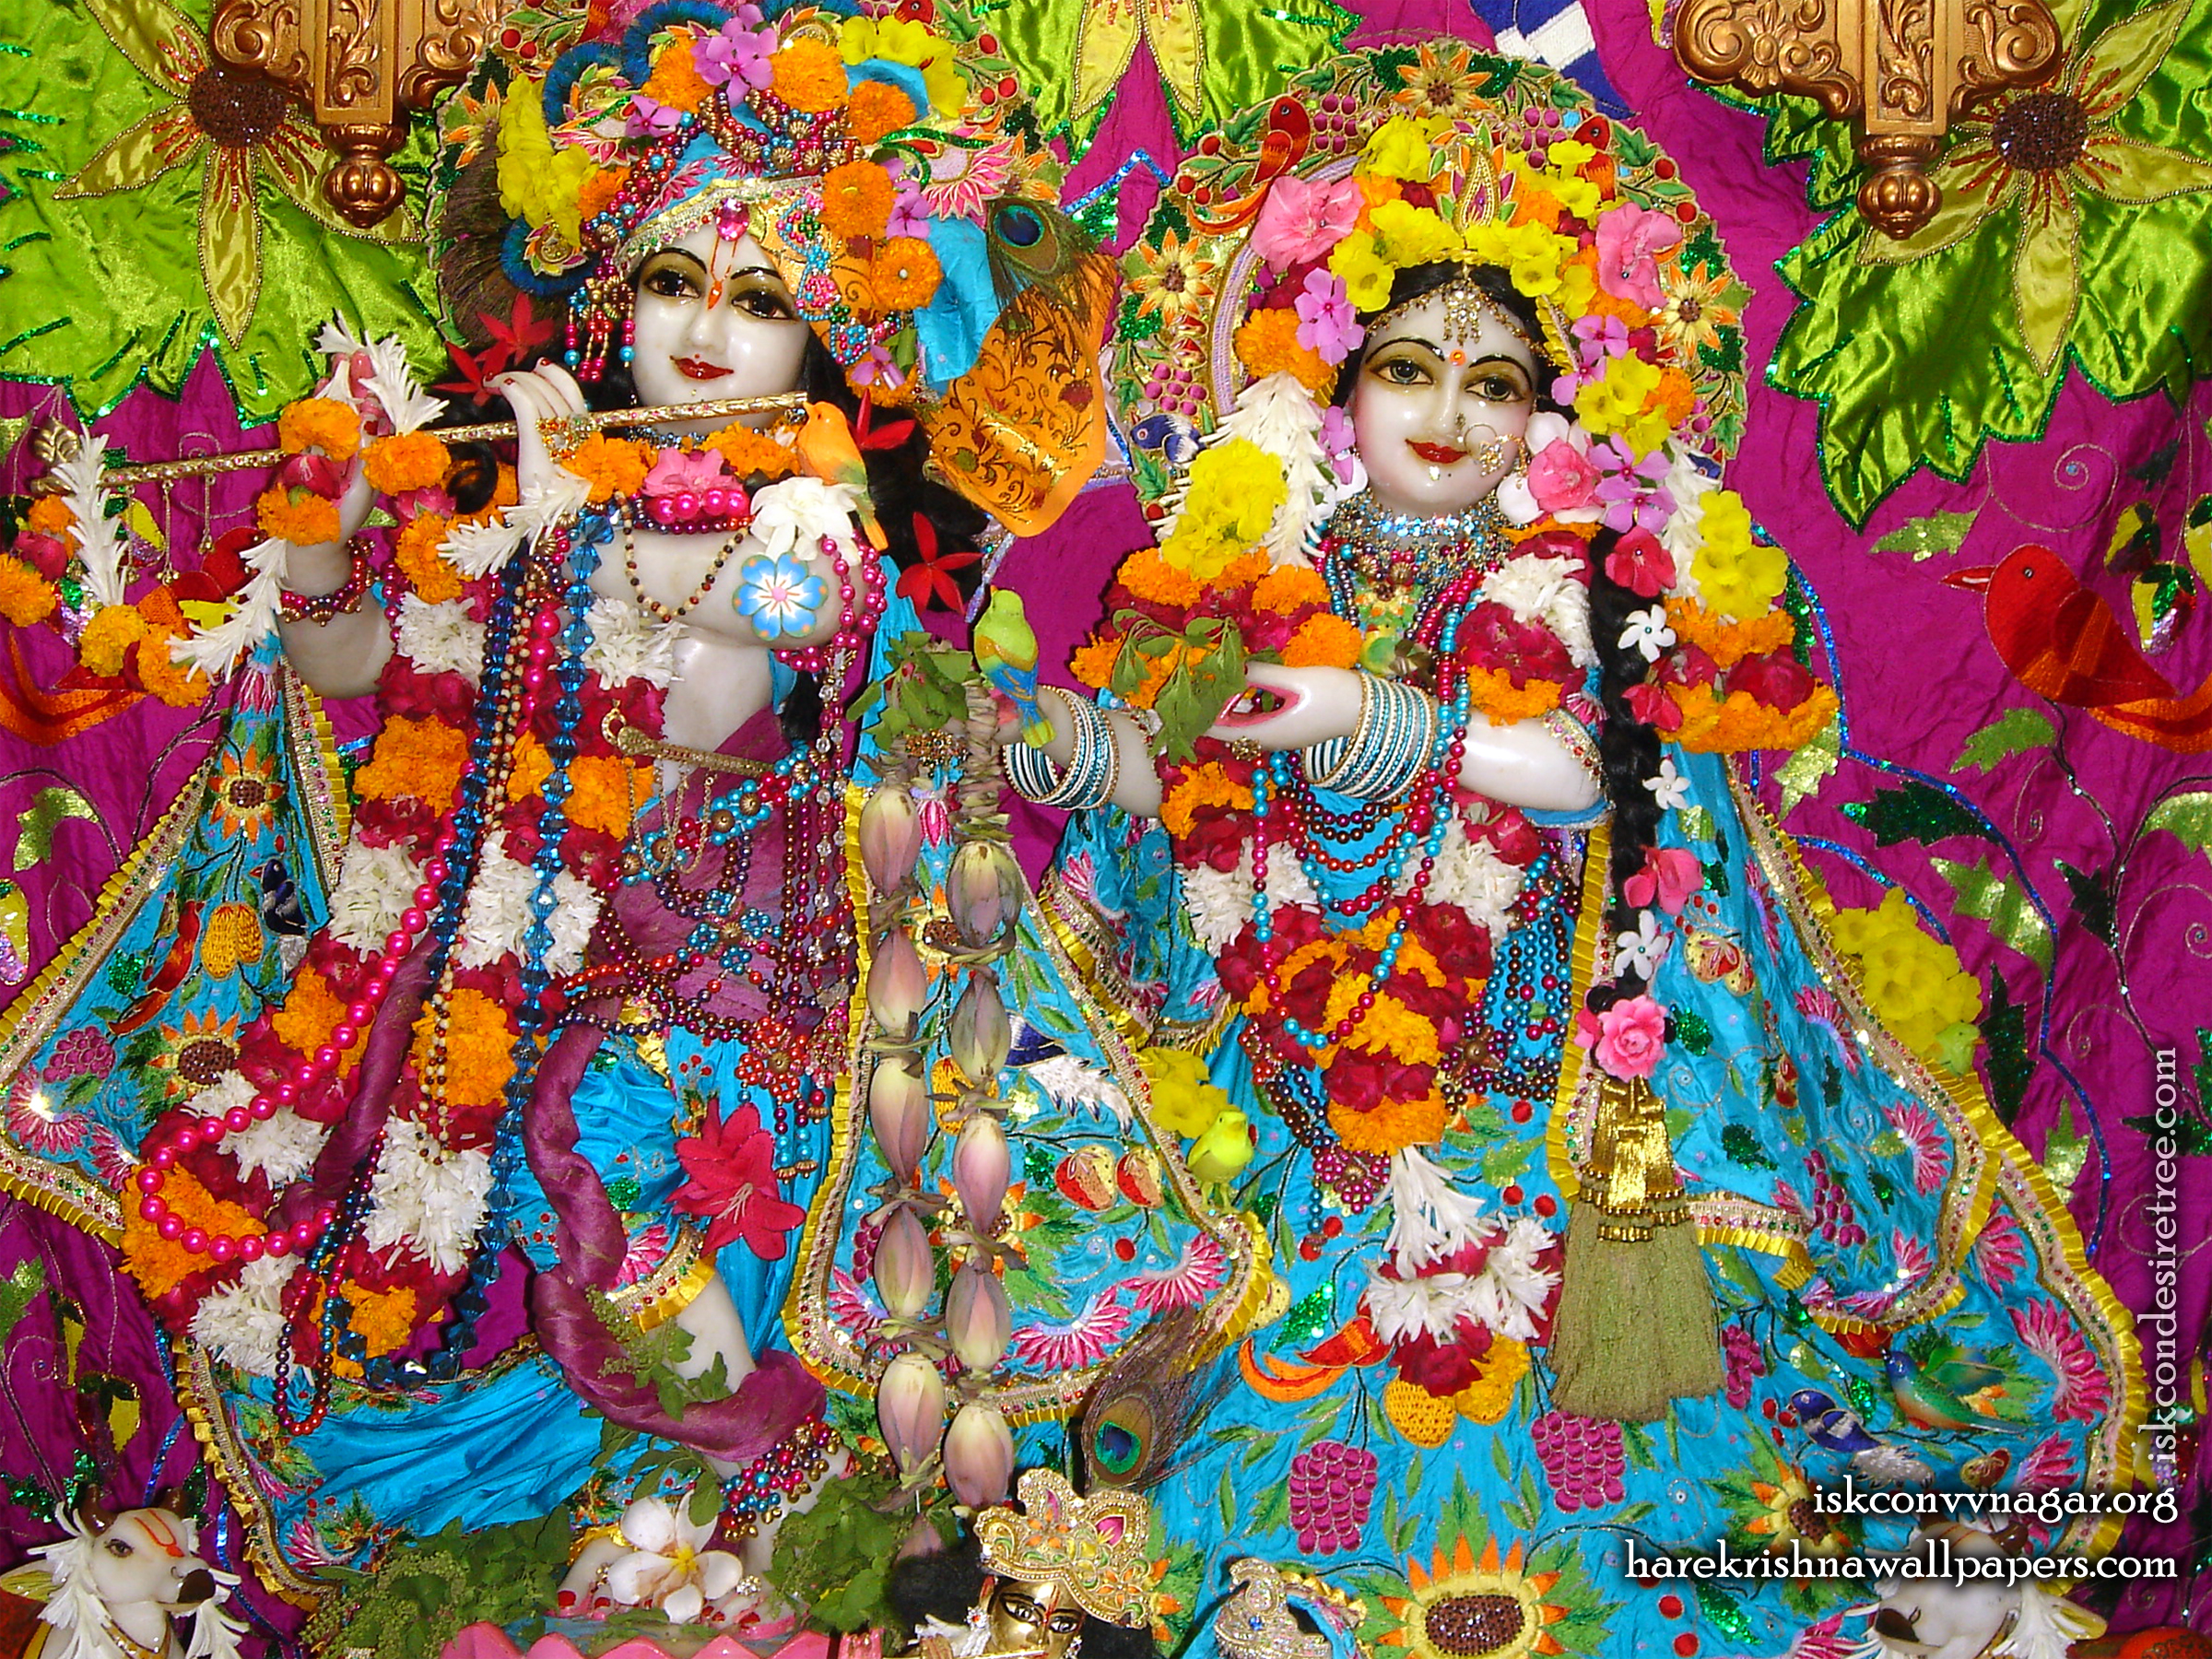 Sri Sri Radha Giridhari Wallpaper (015) Size 2400x1800 Download